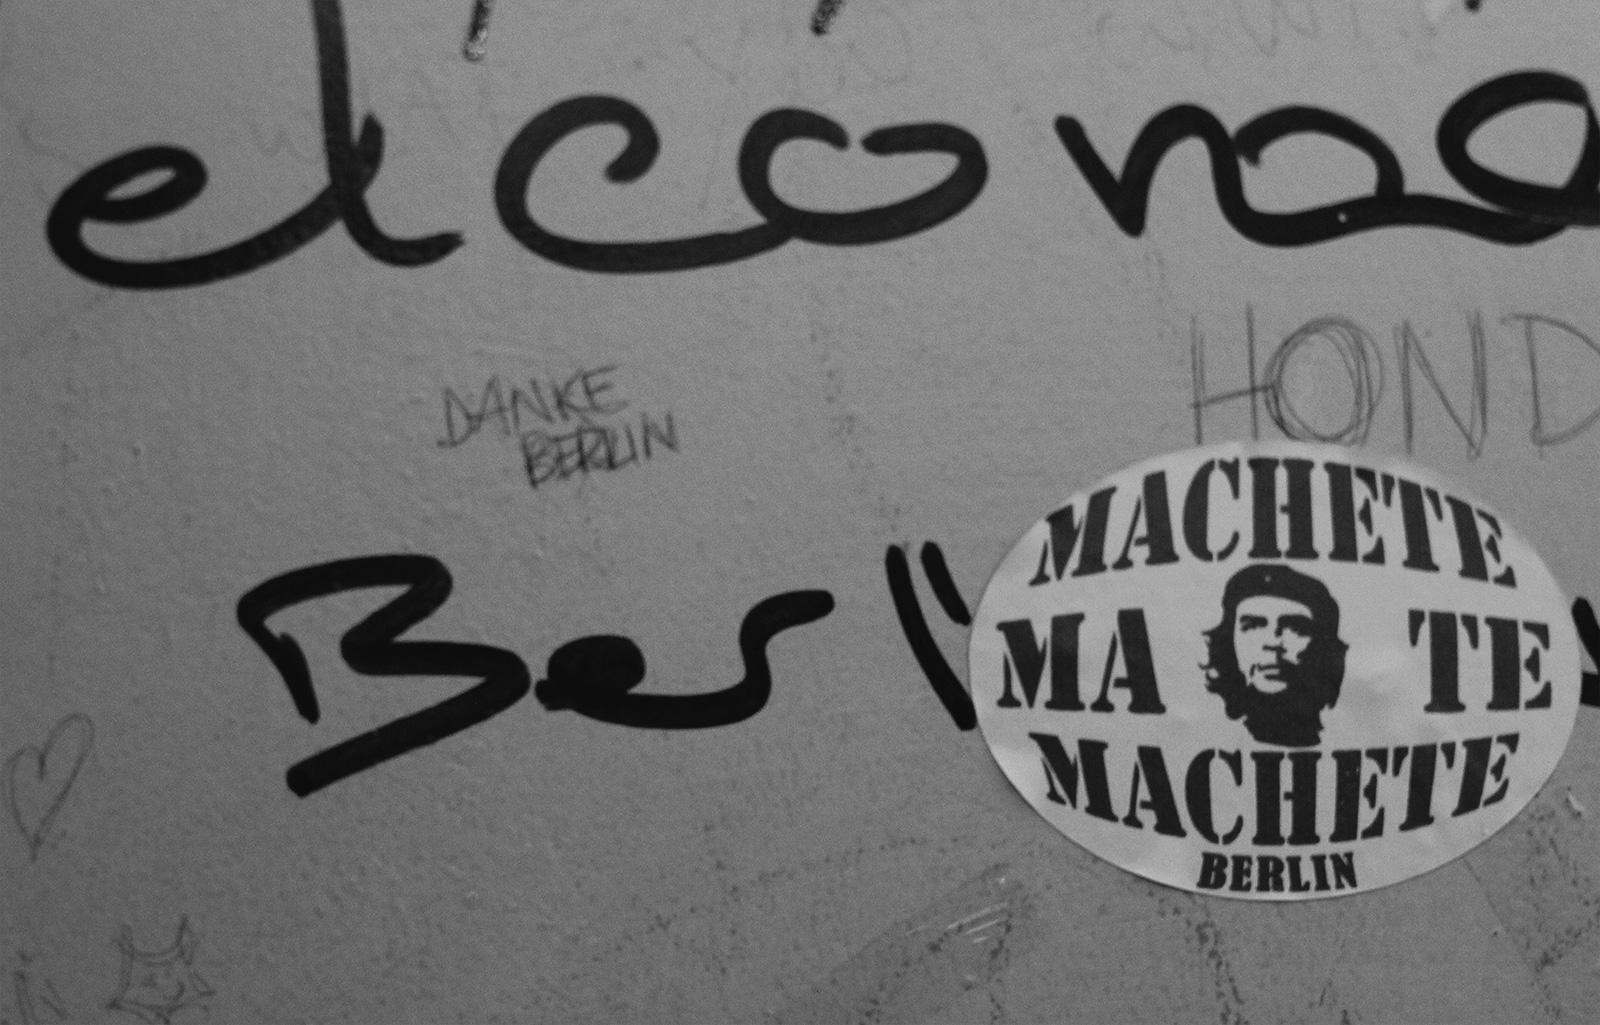 berlin-14okt-23